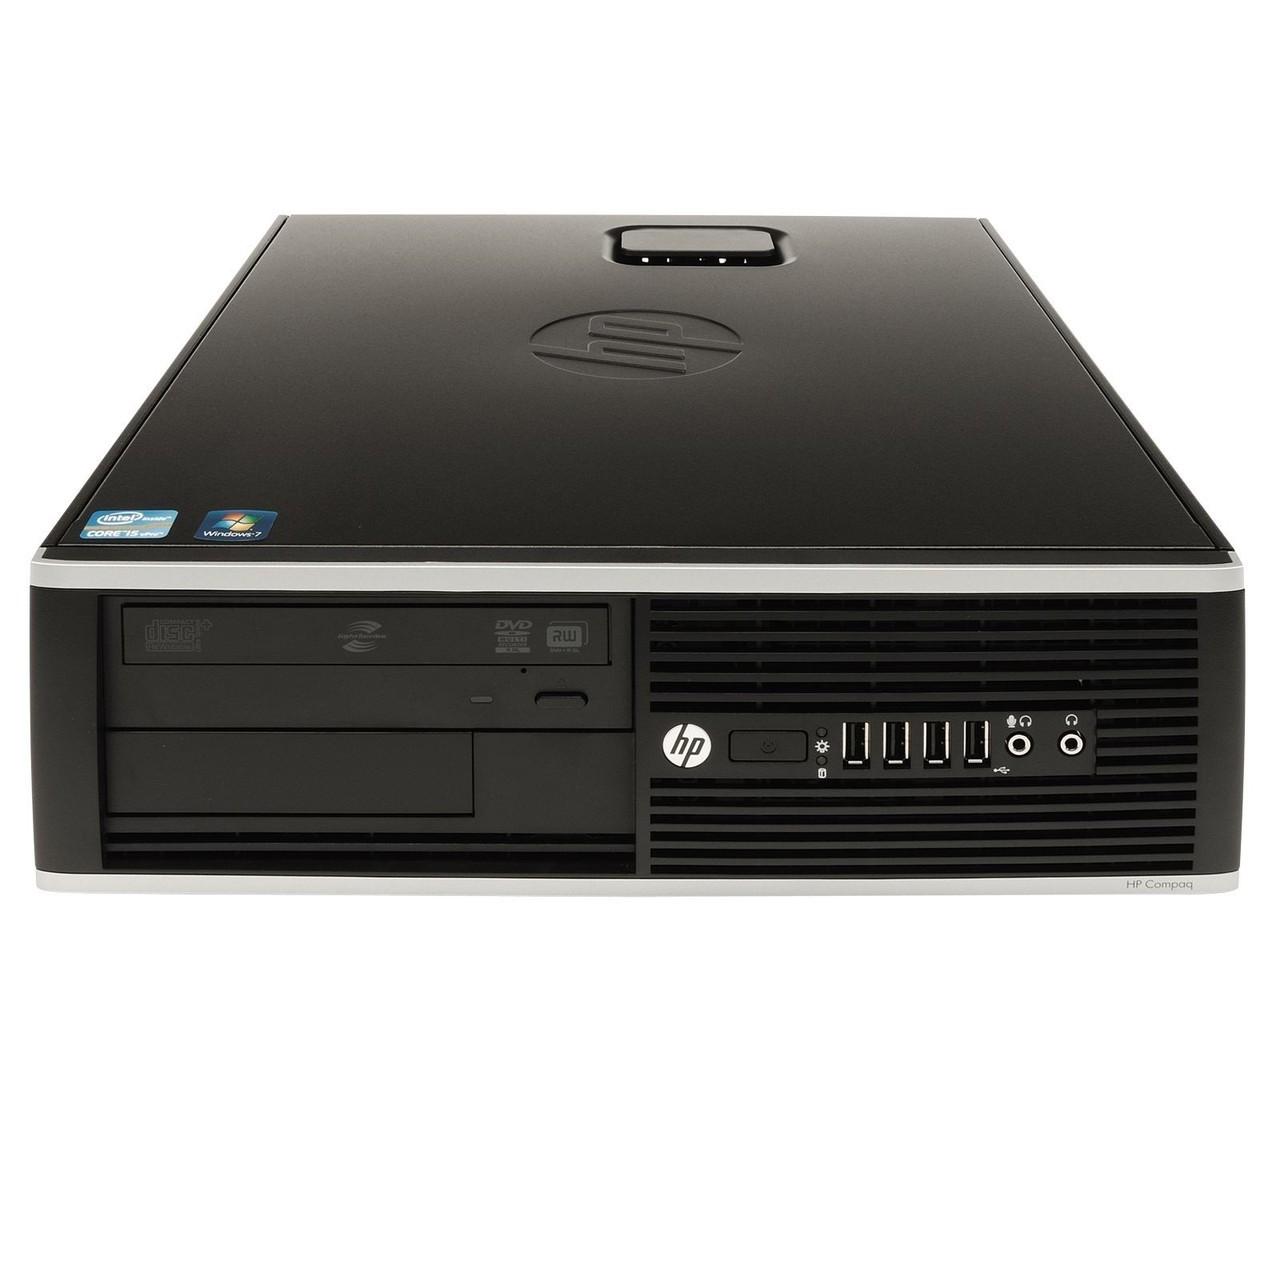 HP 8100 SFF gtechit refurbished desktop christchurch workstation